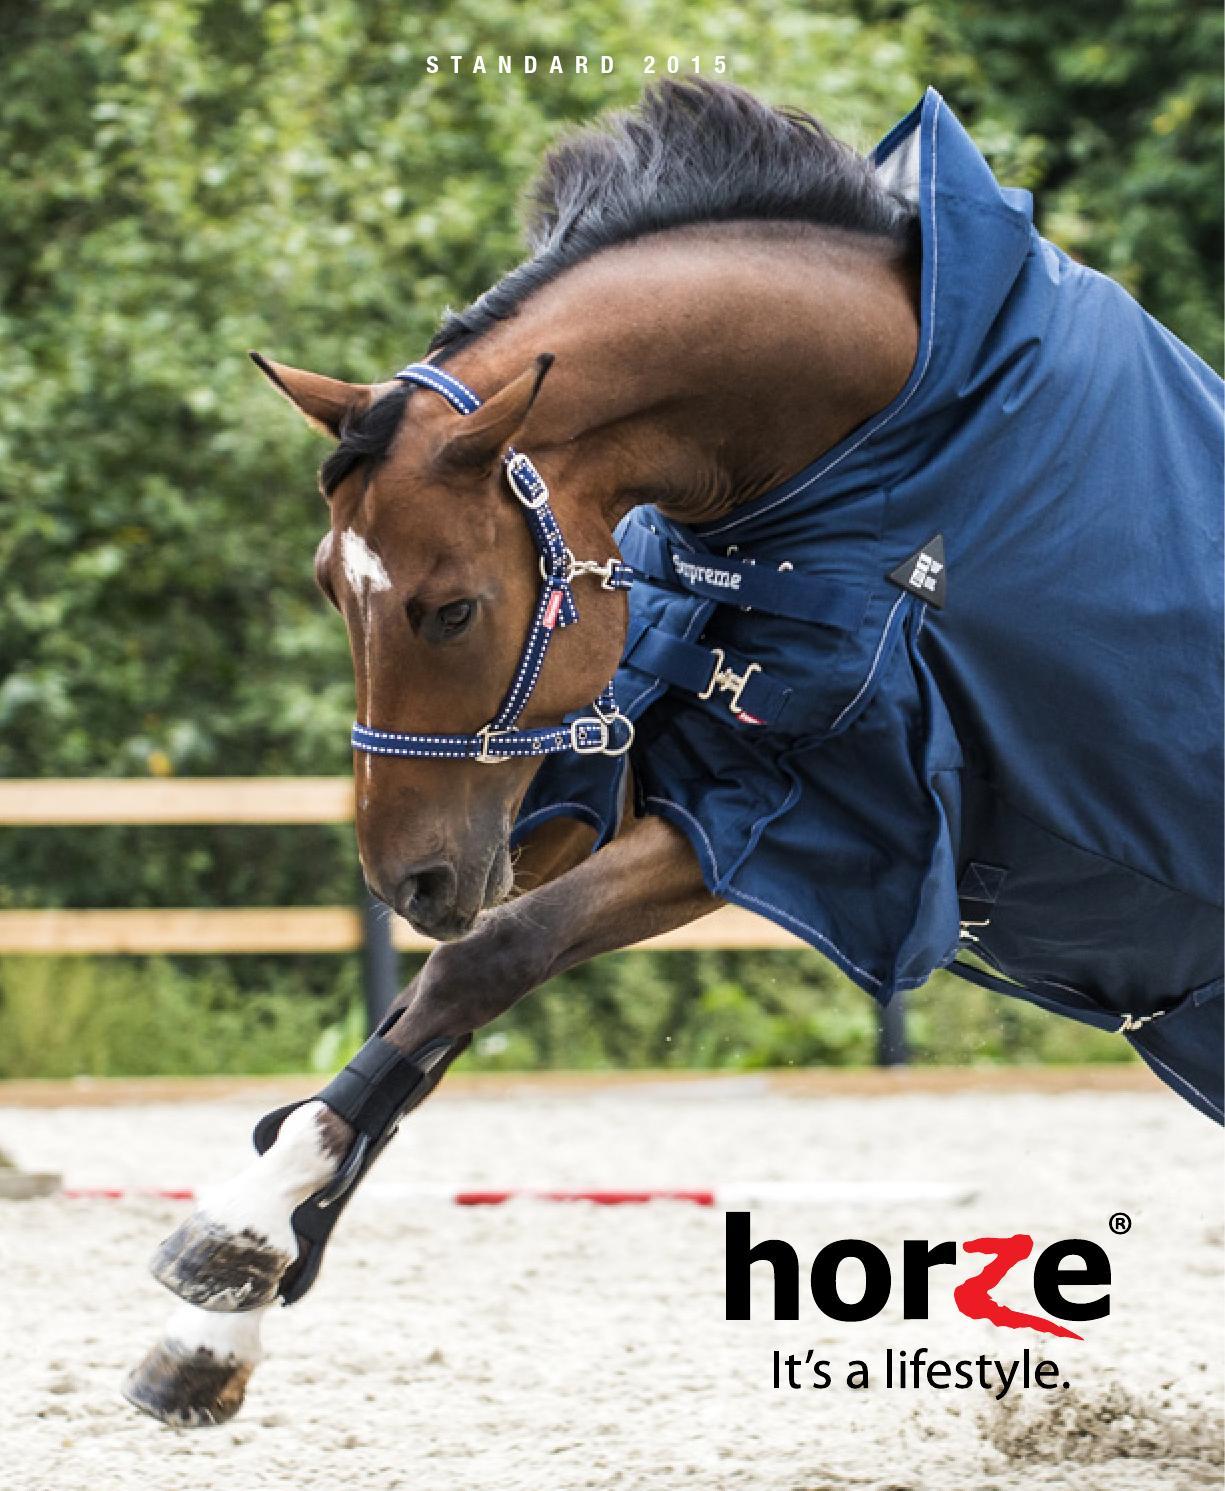 Horze bZeen Reflective Wrap Riding Sheet Exercise in Low Light Orange